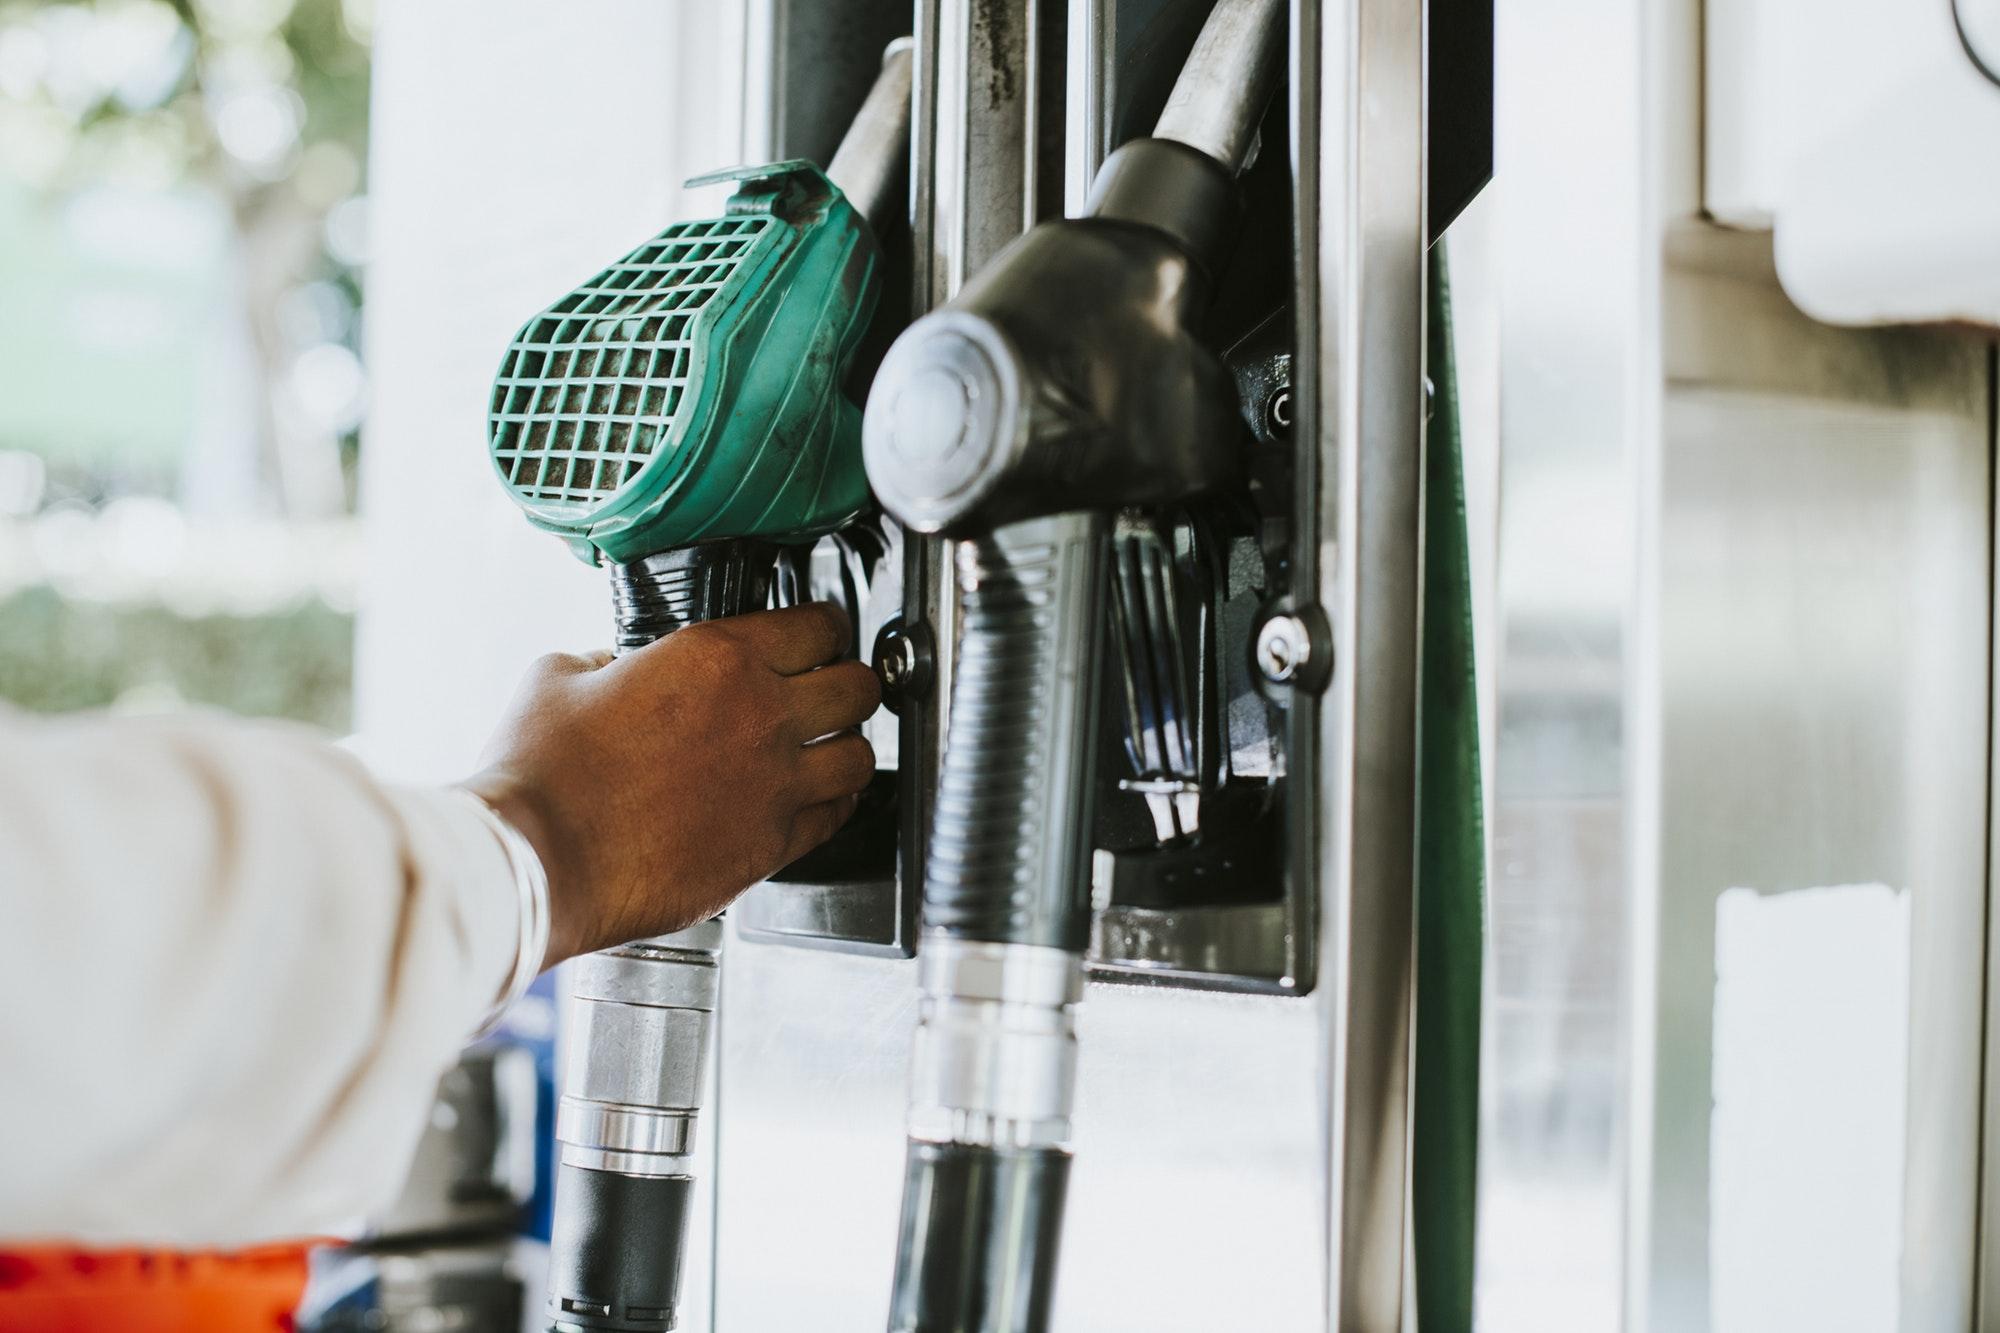 Man grabbing a fuel nozzle to refuel his vehicle